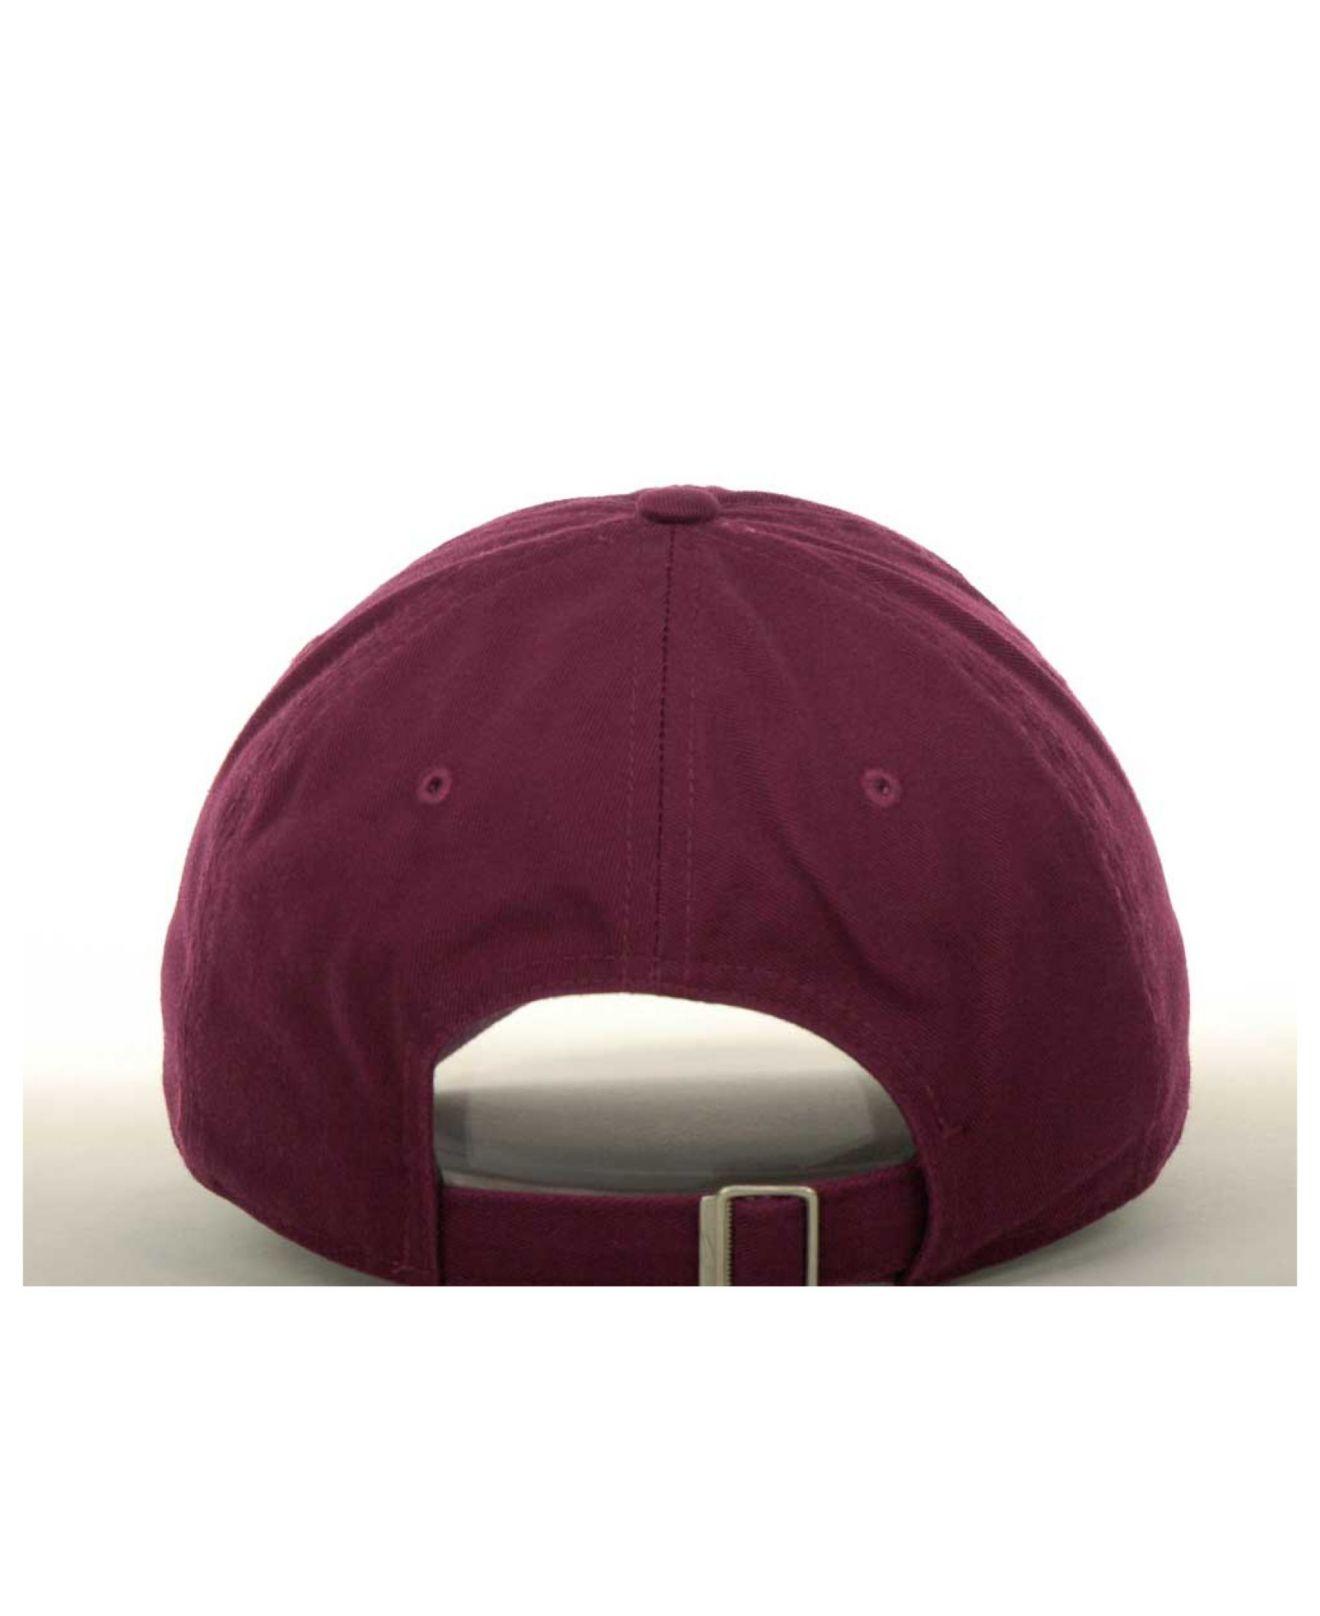 ... low price nike cap maroon b7af2 ba9d9 eaa4e618e389